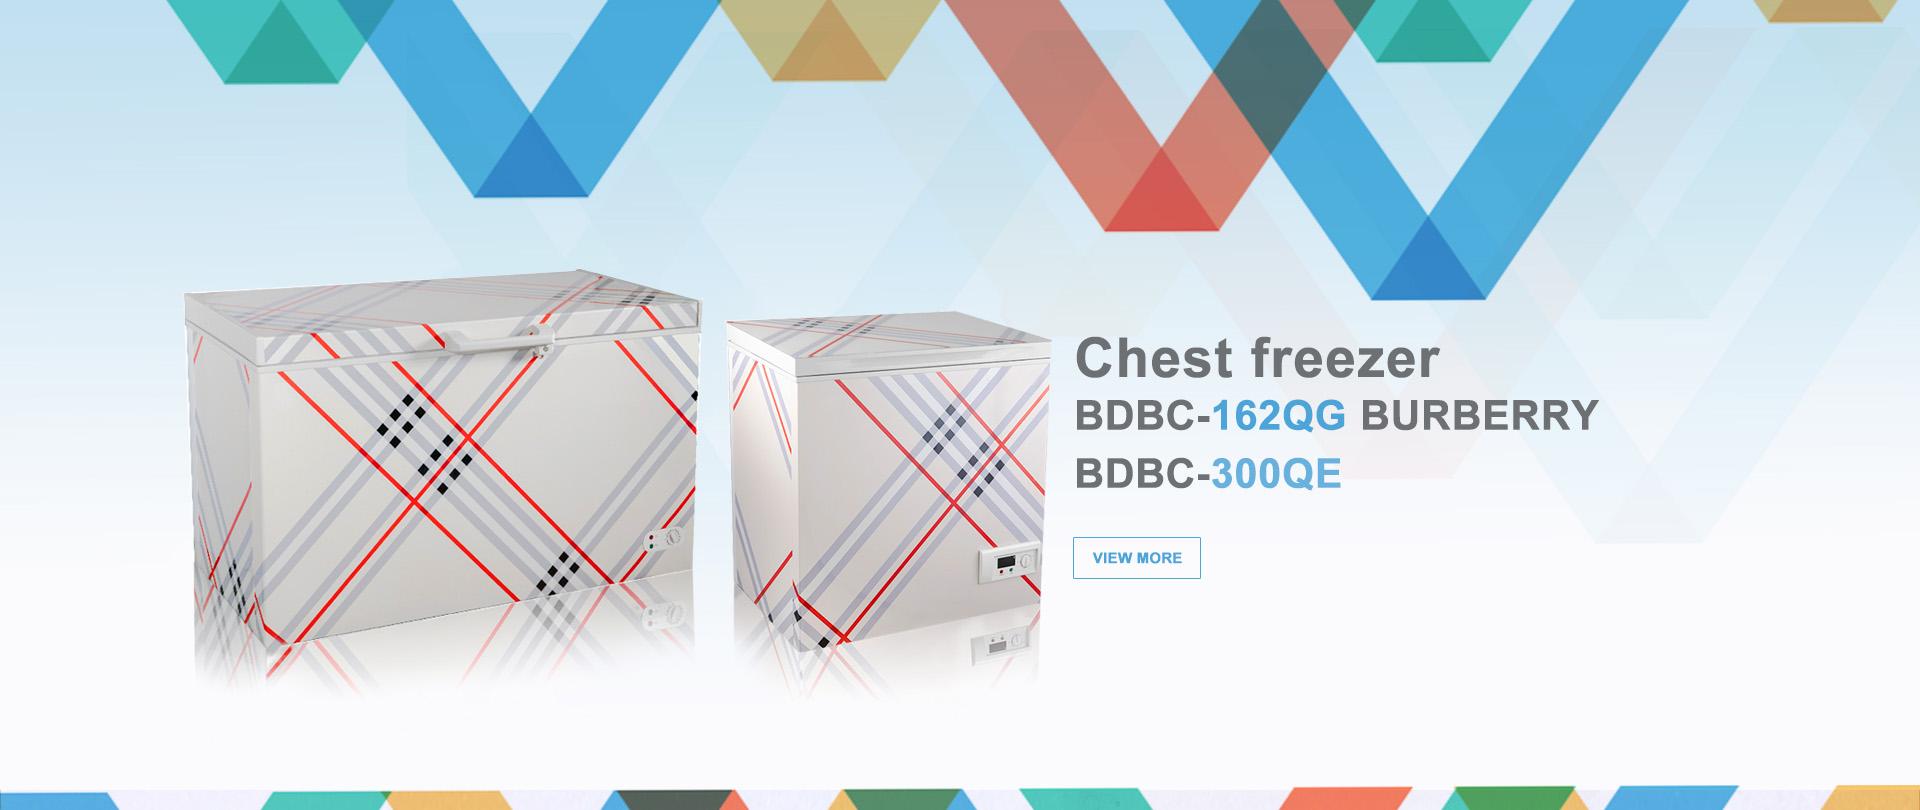 BD/BC-162QG BURBERRY freezer